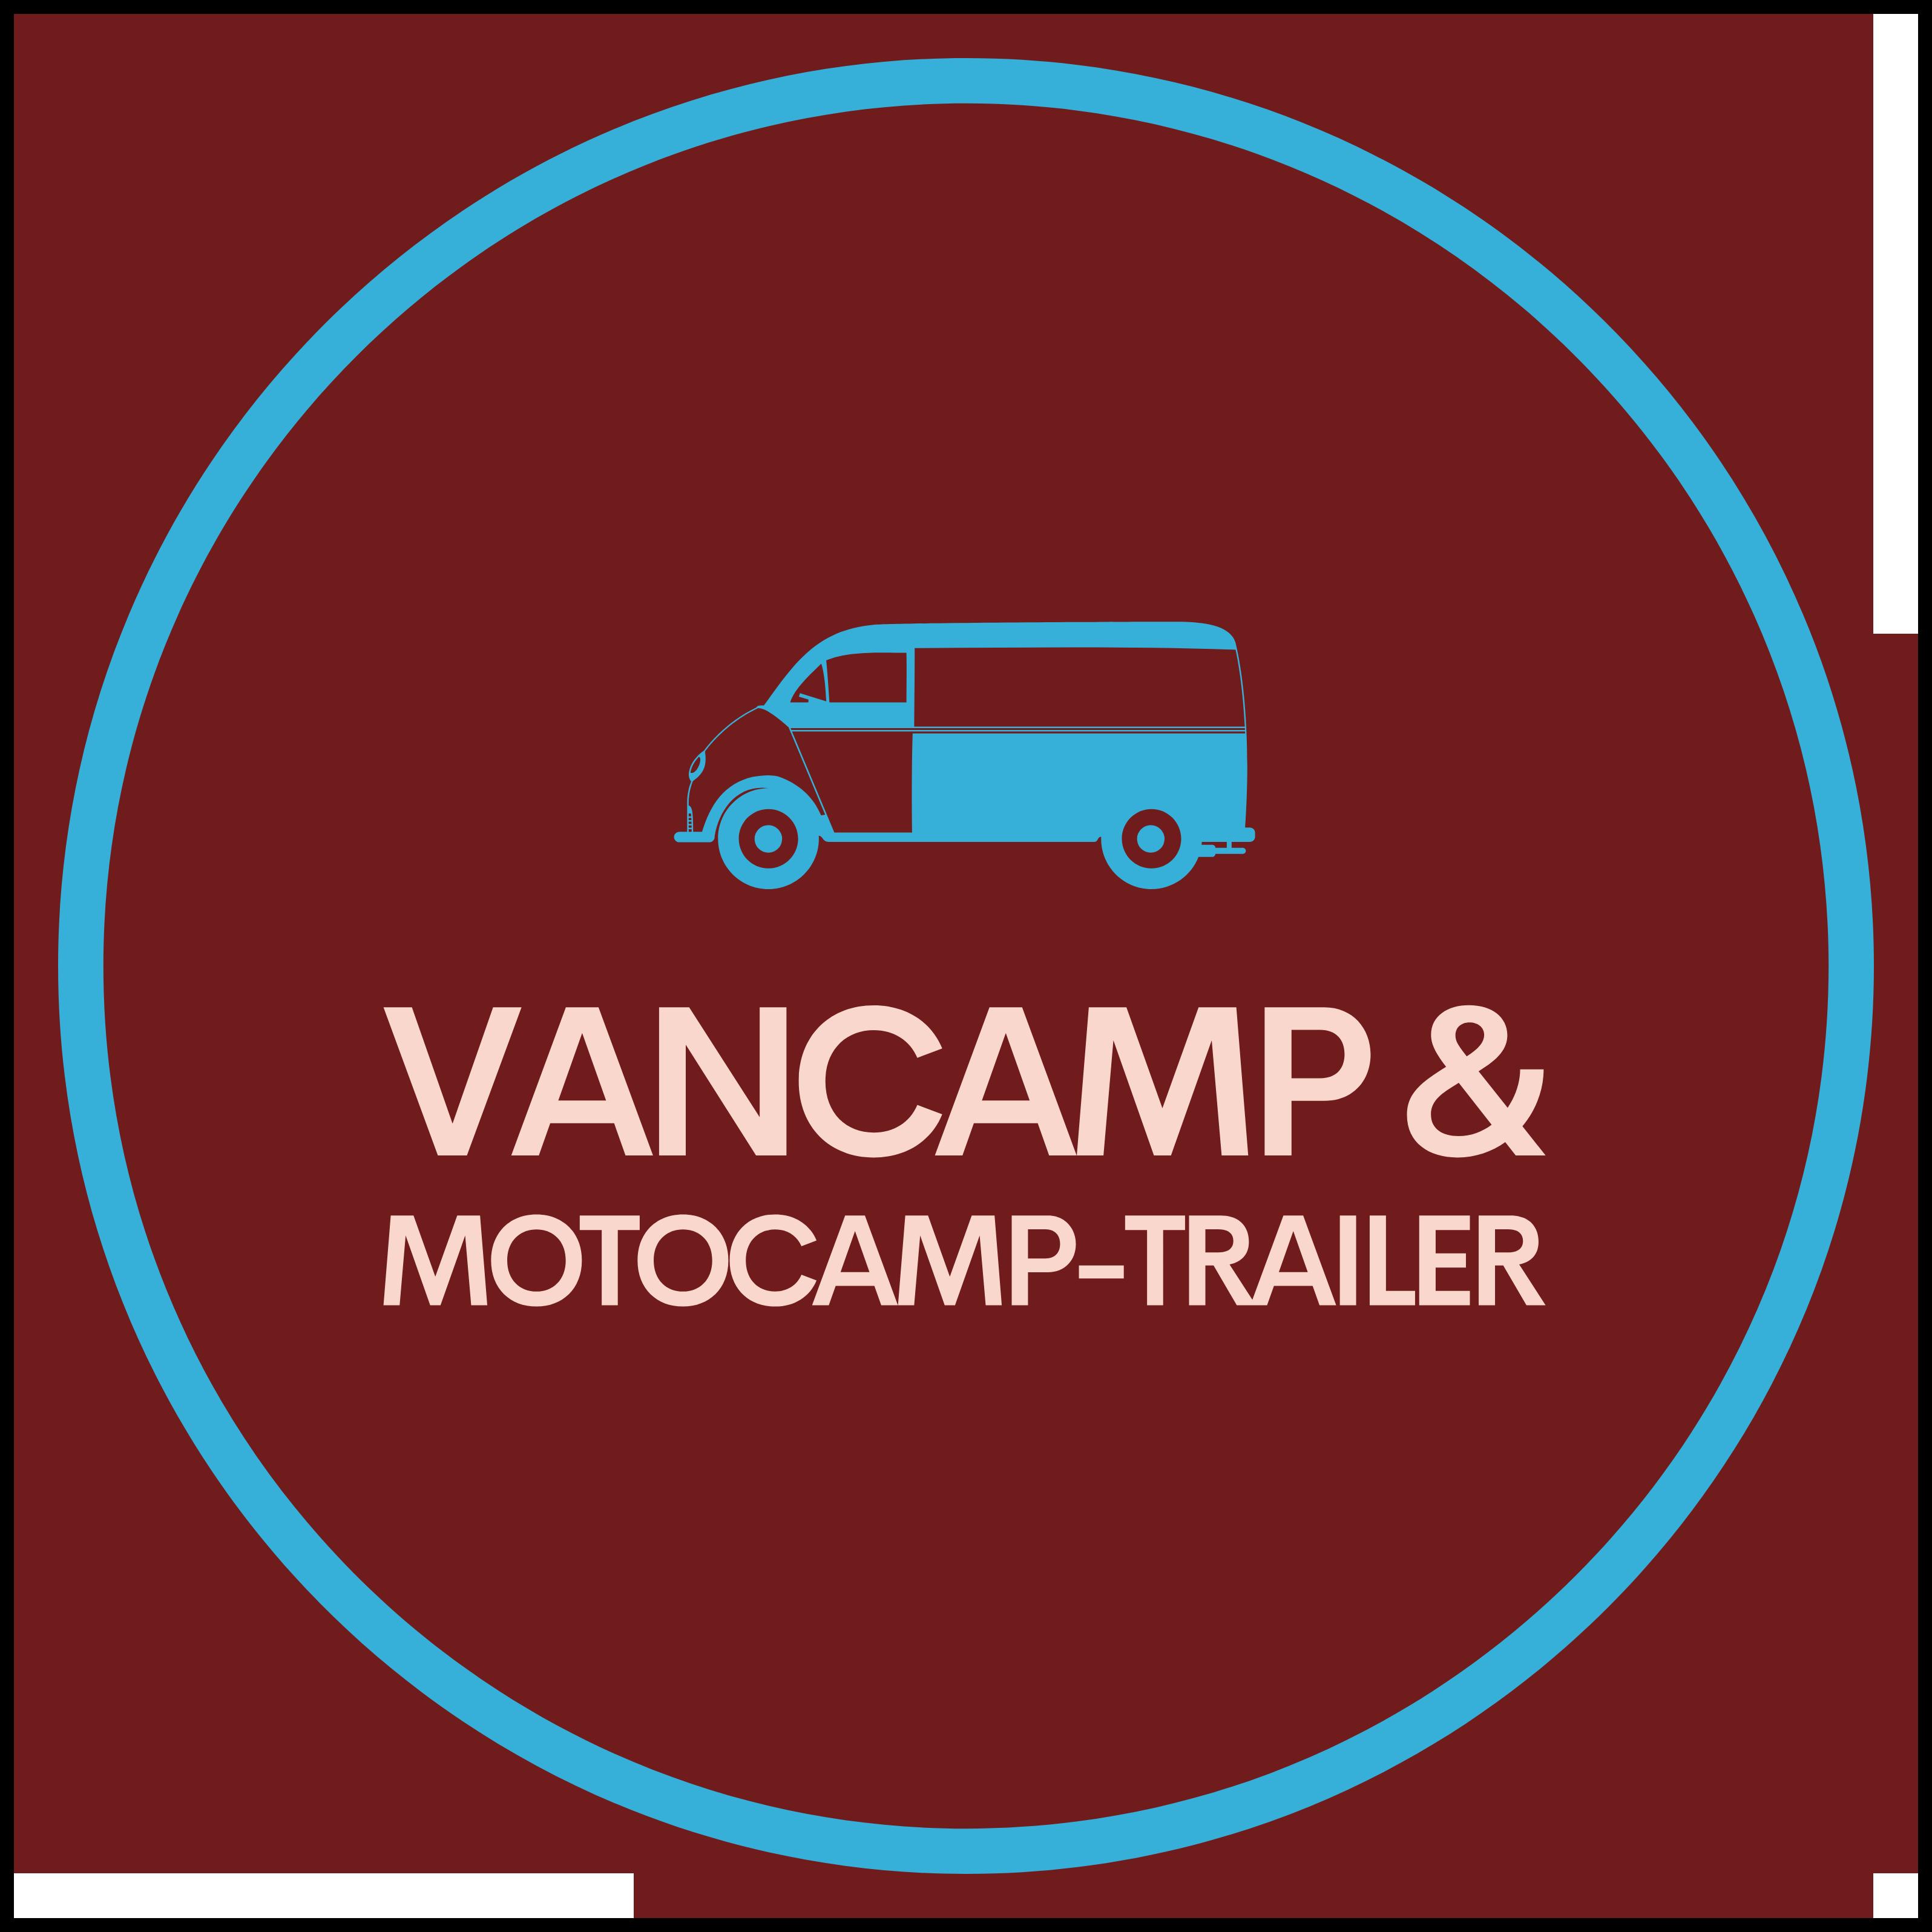 VanCamp